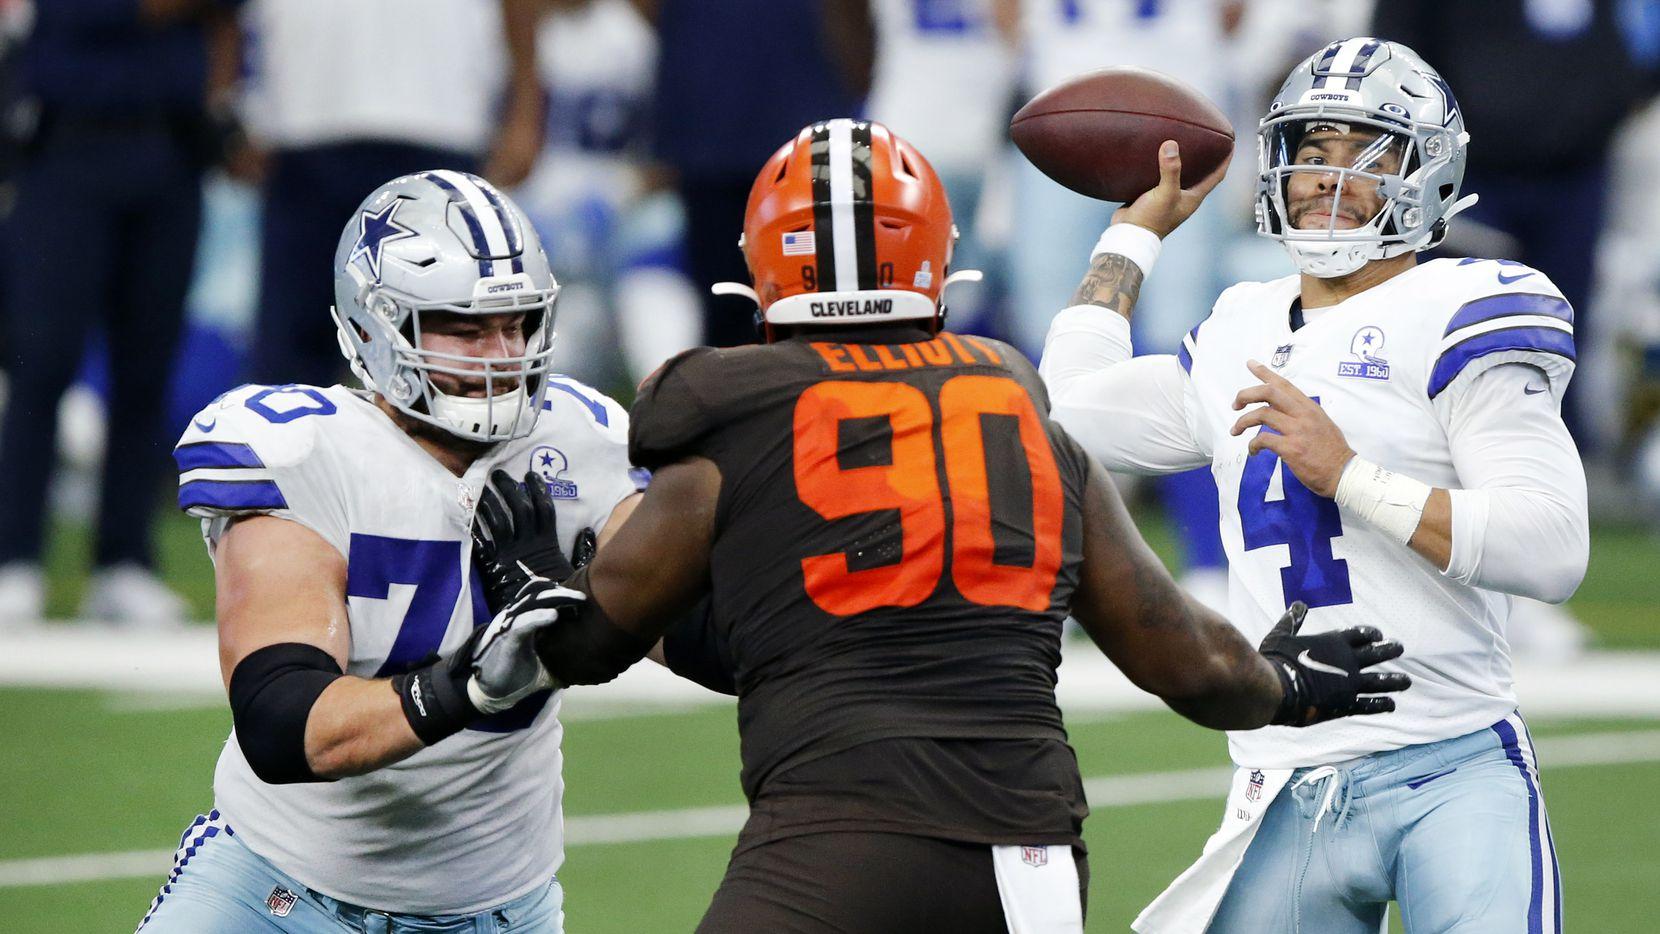 Dallas Cowboys offensive guard Zack Martin (70) blocks Cleveland Browns defensive tackle Jordan Elliott (90) so quarterback Dak Prescott (4) can get off a throw during the fourth quarter at AT&T Stadium in Arlington, Texas, Sunday, October 4, 2020.